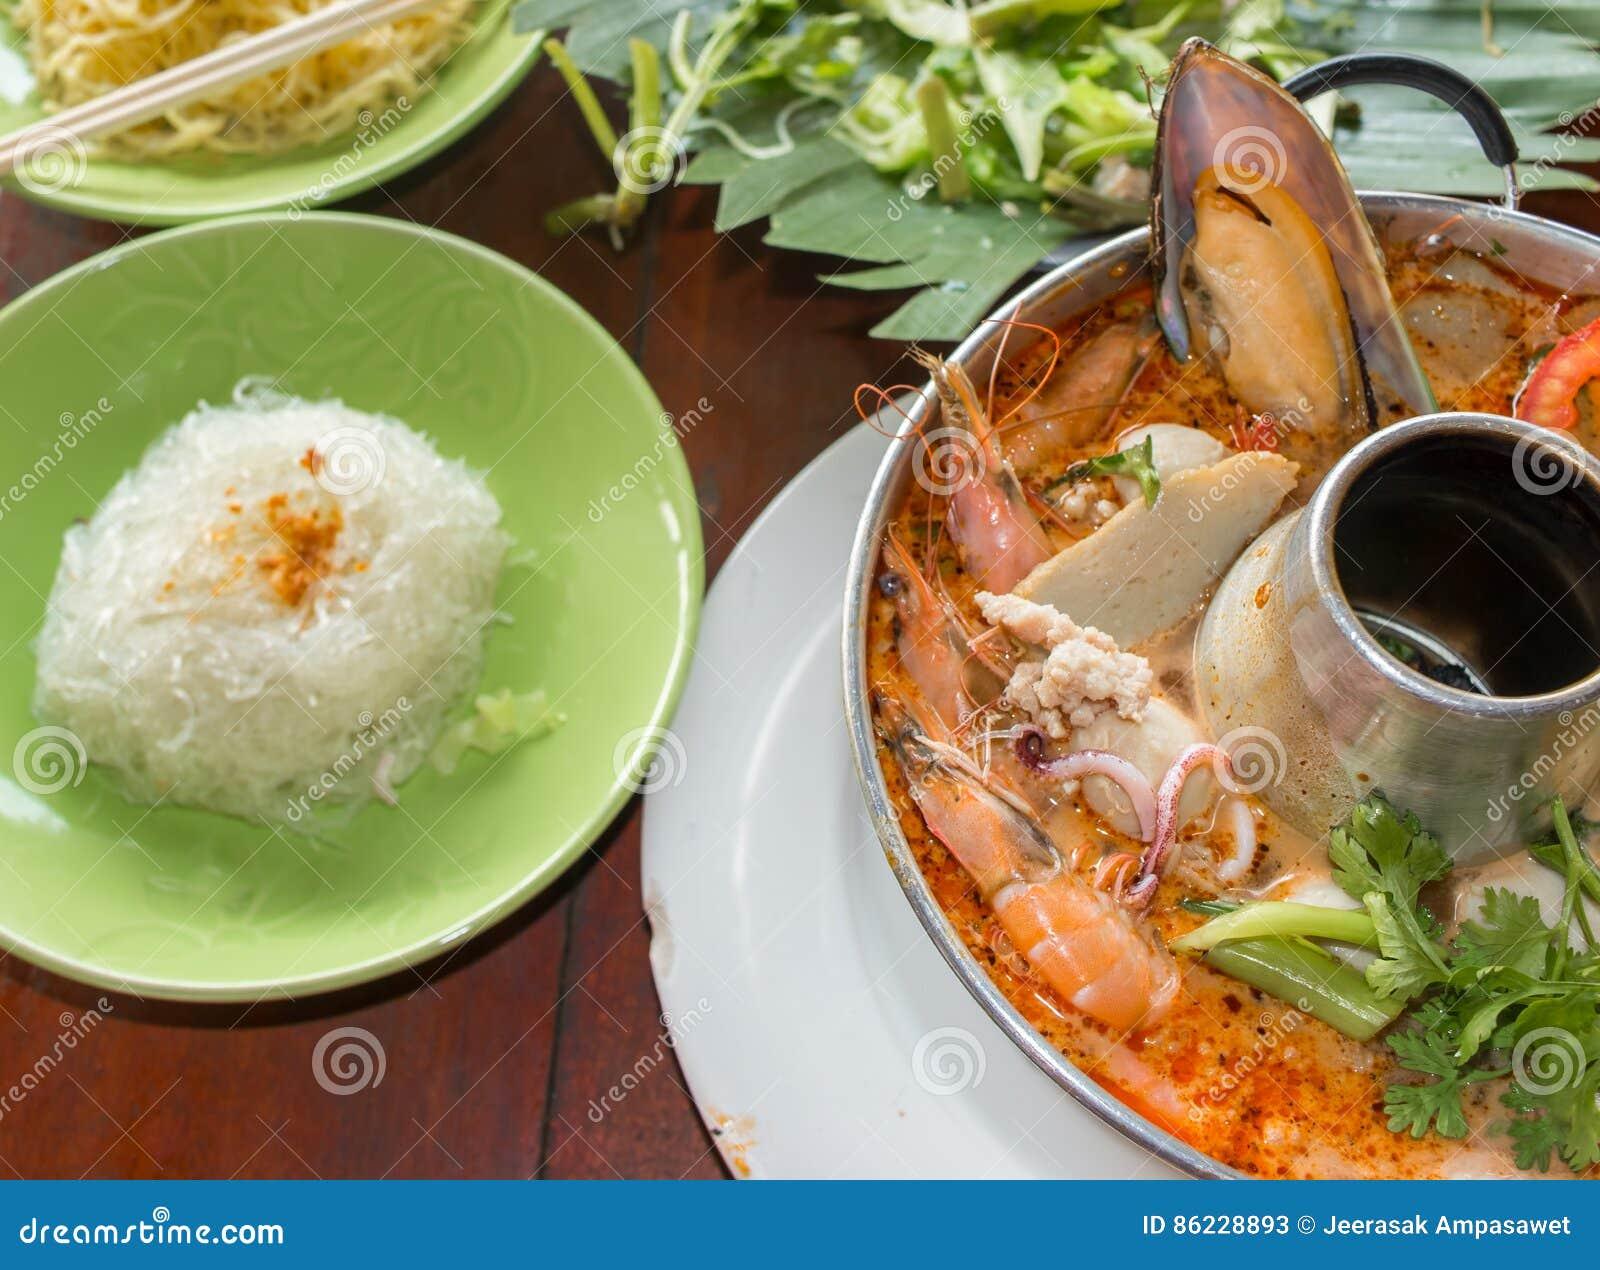 Koong αρσενικό (ζώο) yum